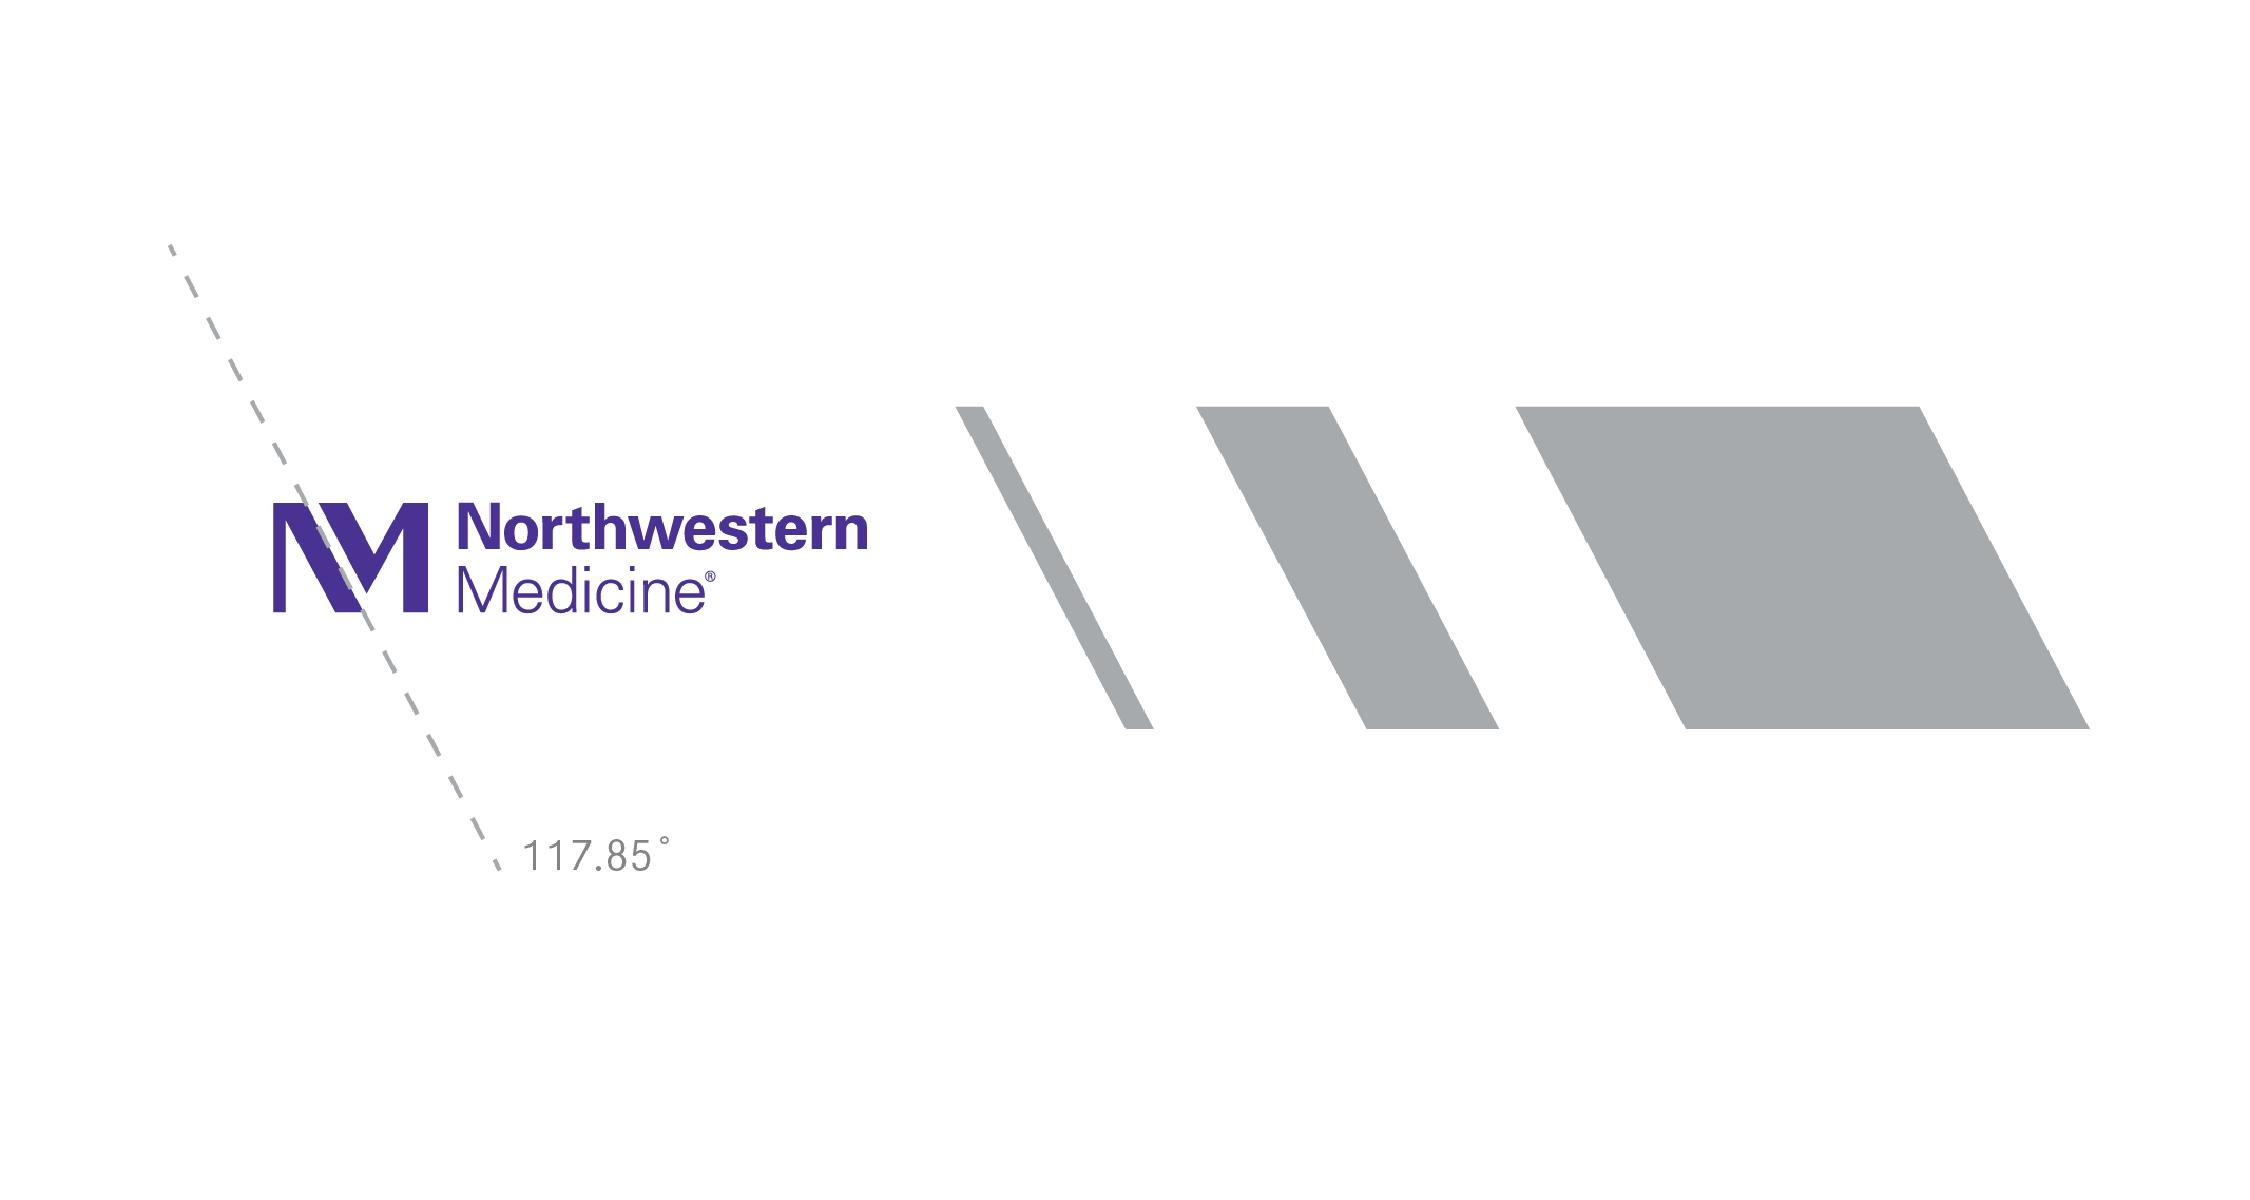 NorthwesternMedicine_website_new-02.png